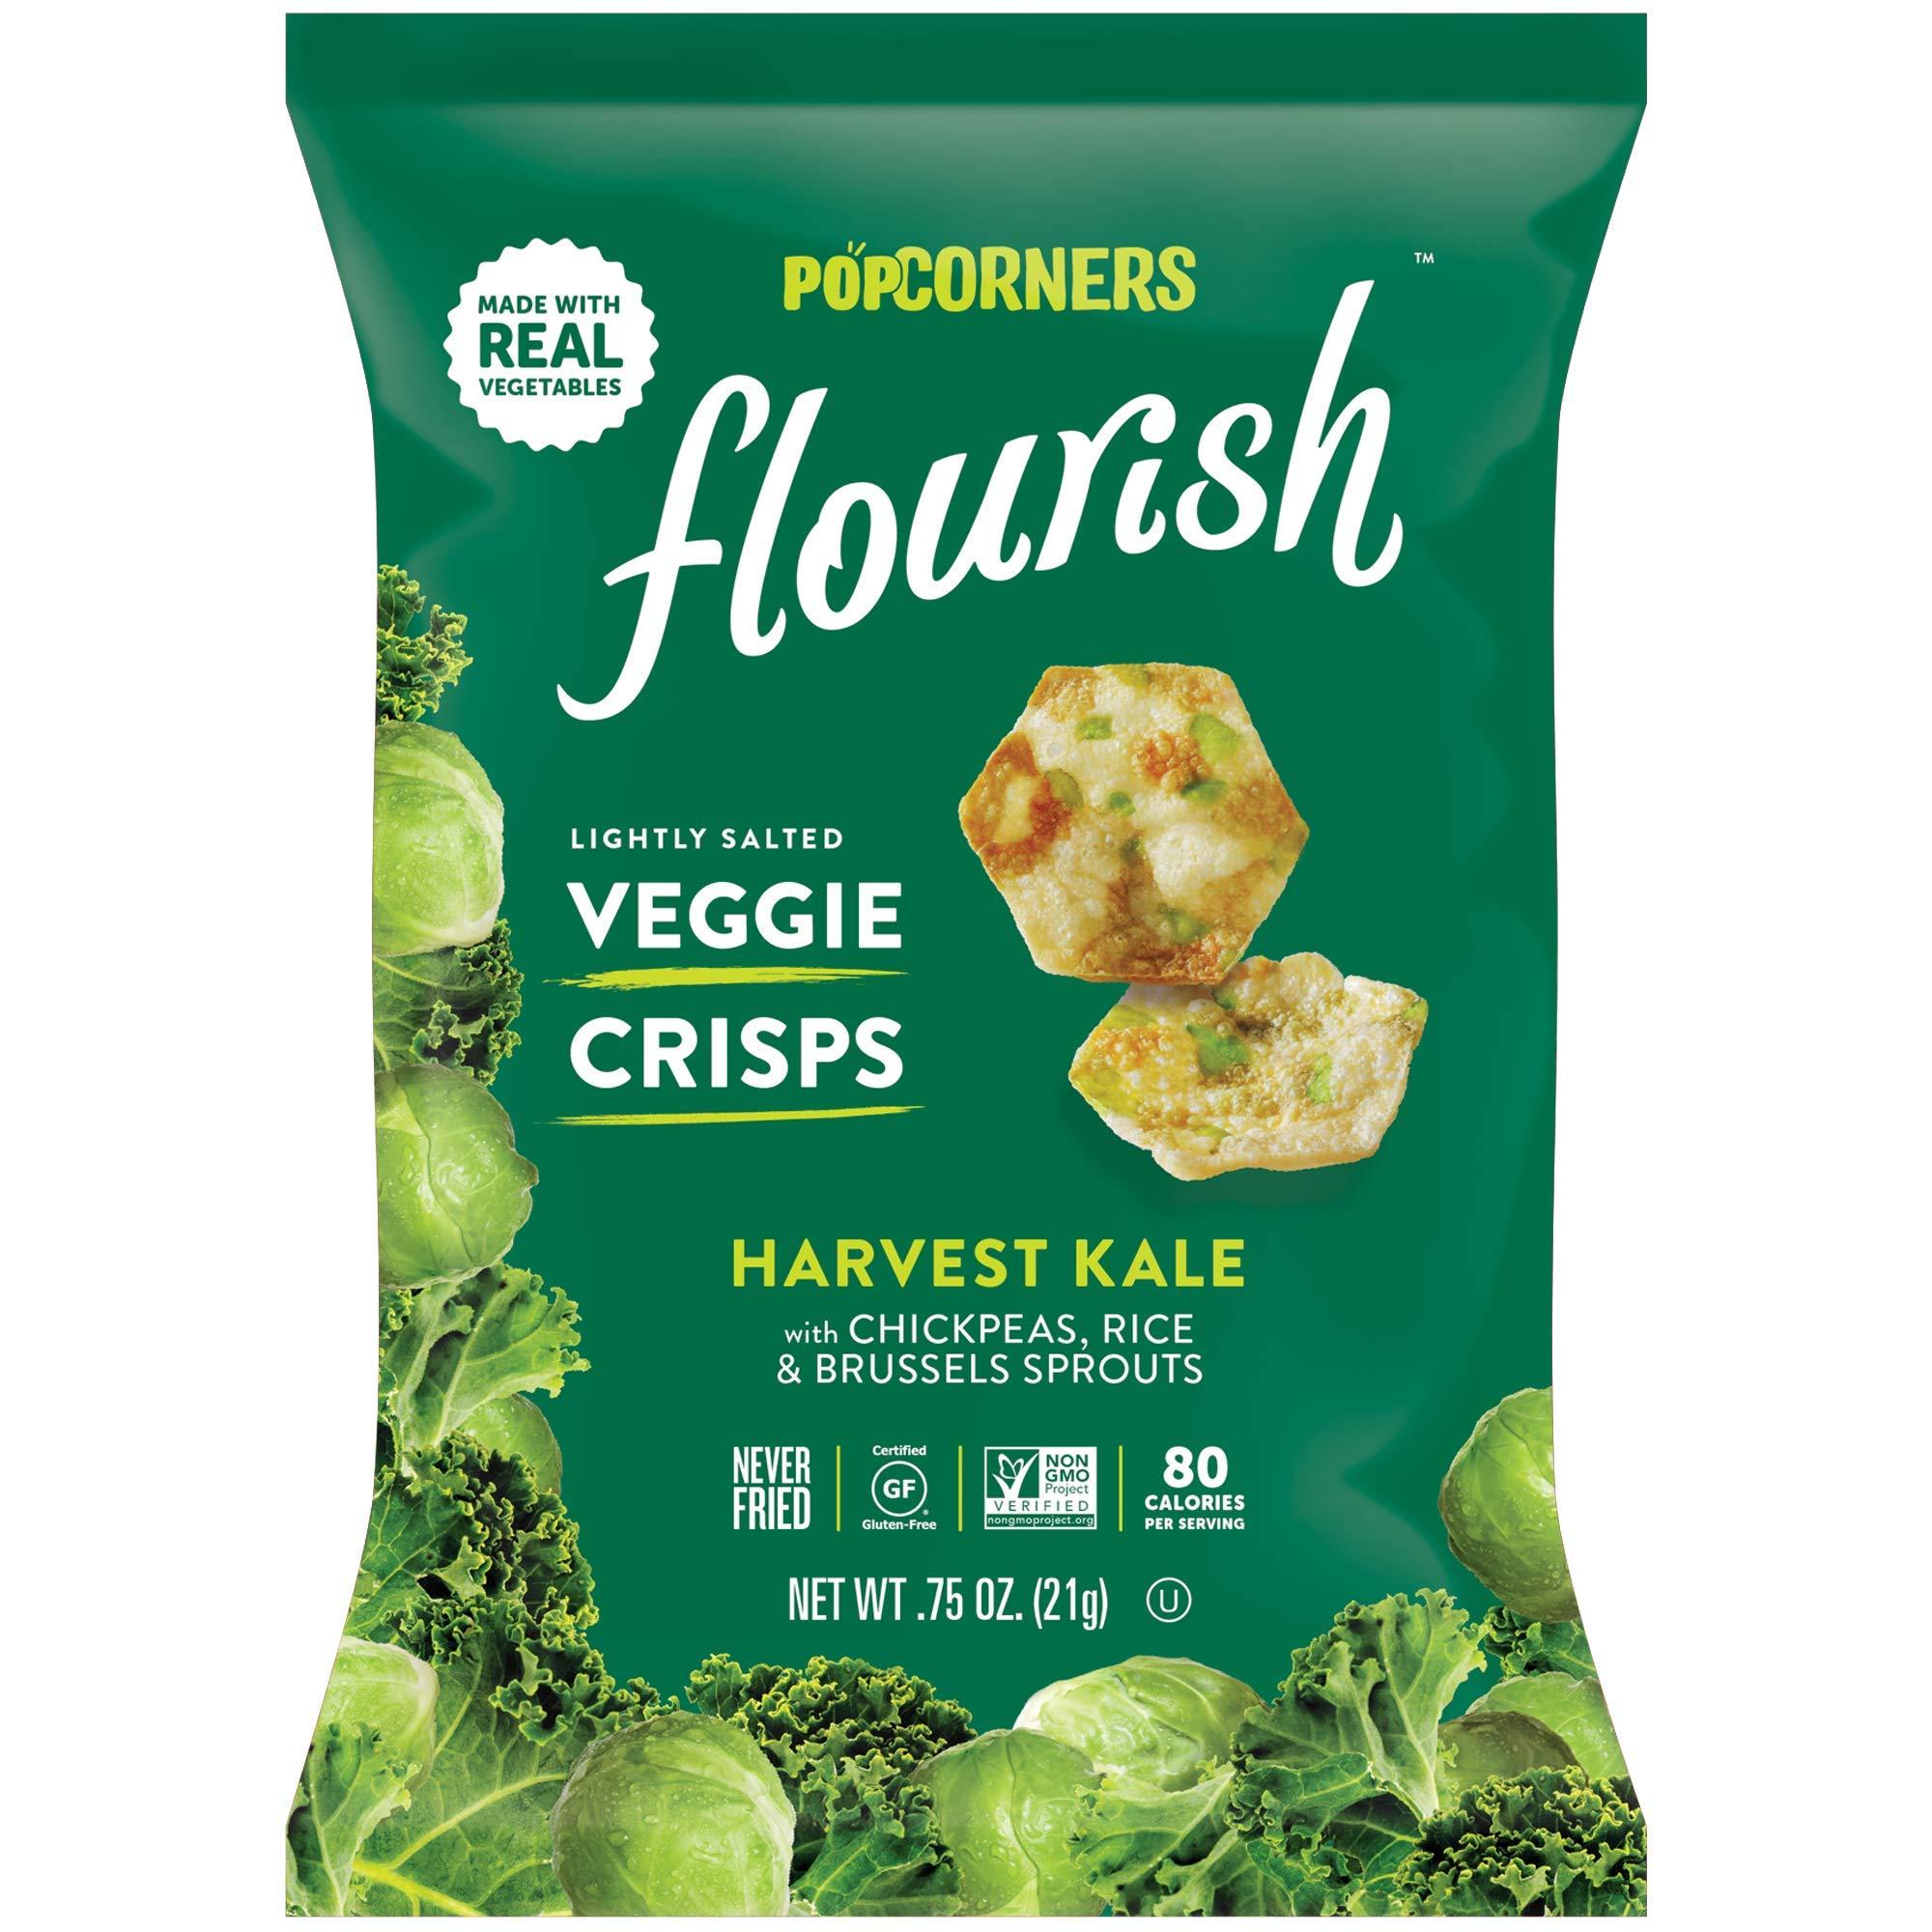 PopCorners Flourish Harvest Kale Veggie Crisps | Plant-Based Protein, Gluten Free Snacks | (24 Pack, .75 oz Snack Bags) by Popcorners